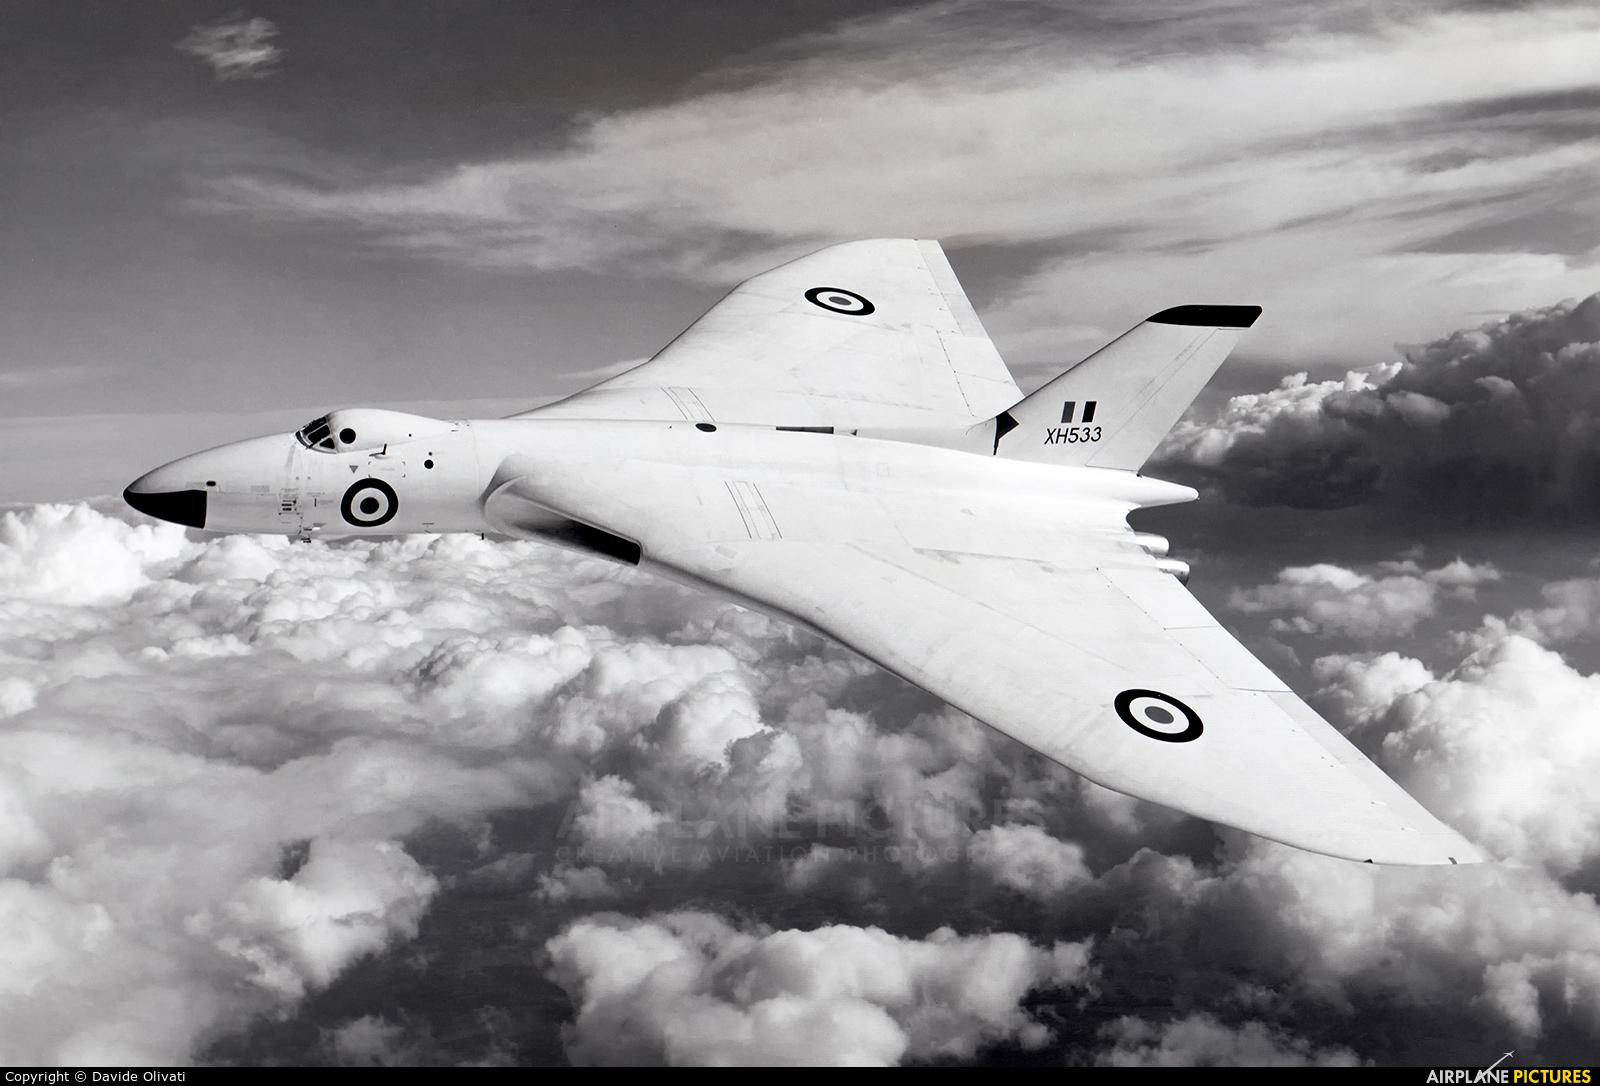 Royal Air Force XH533 aircraft at Unknown Location